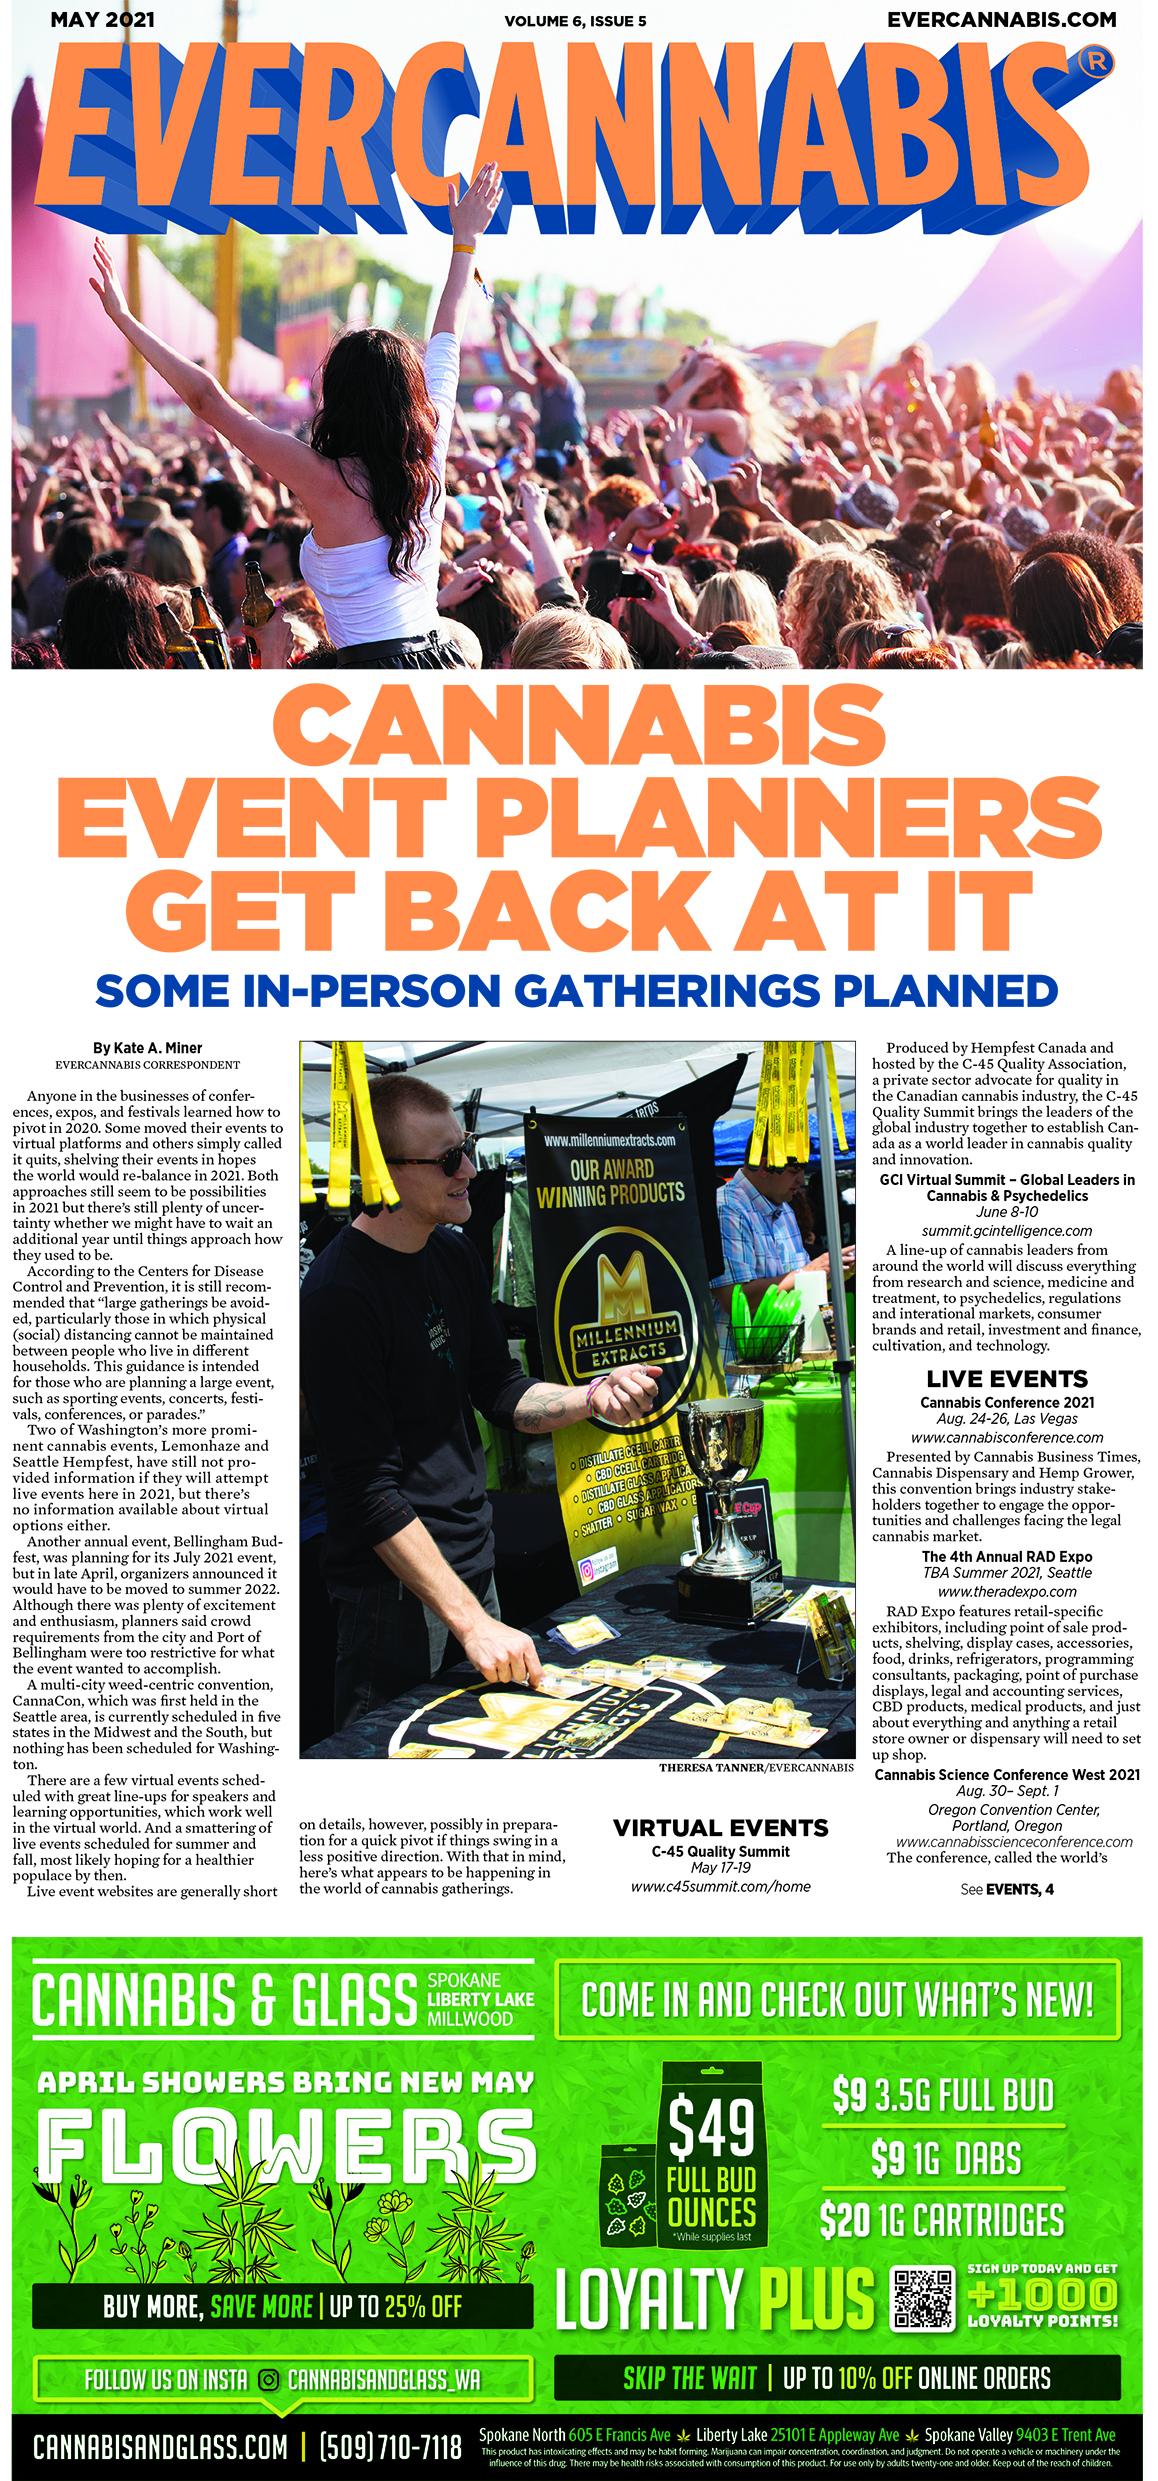 Evercannabis May 2021